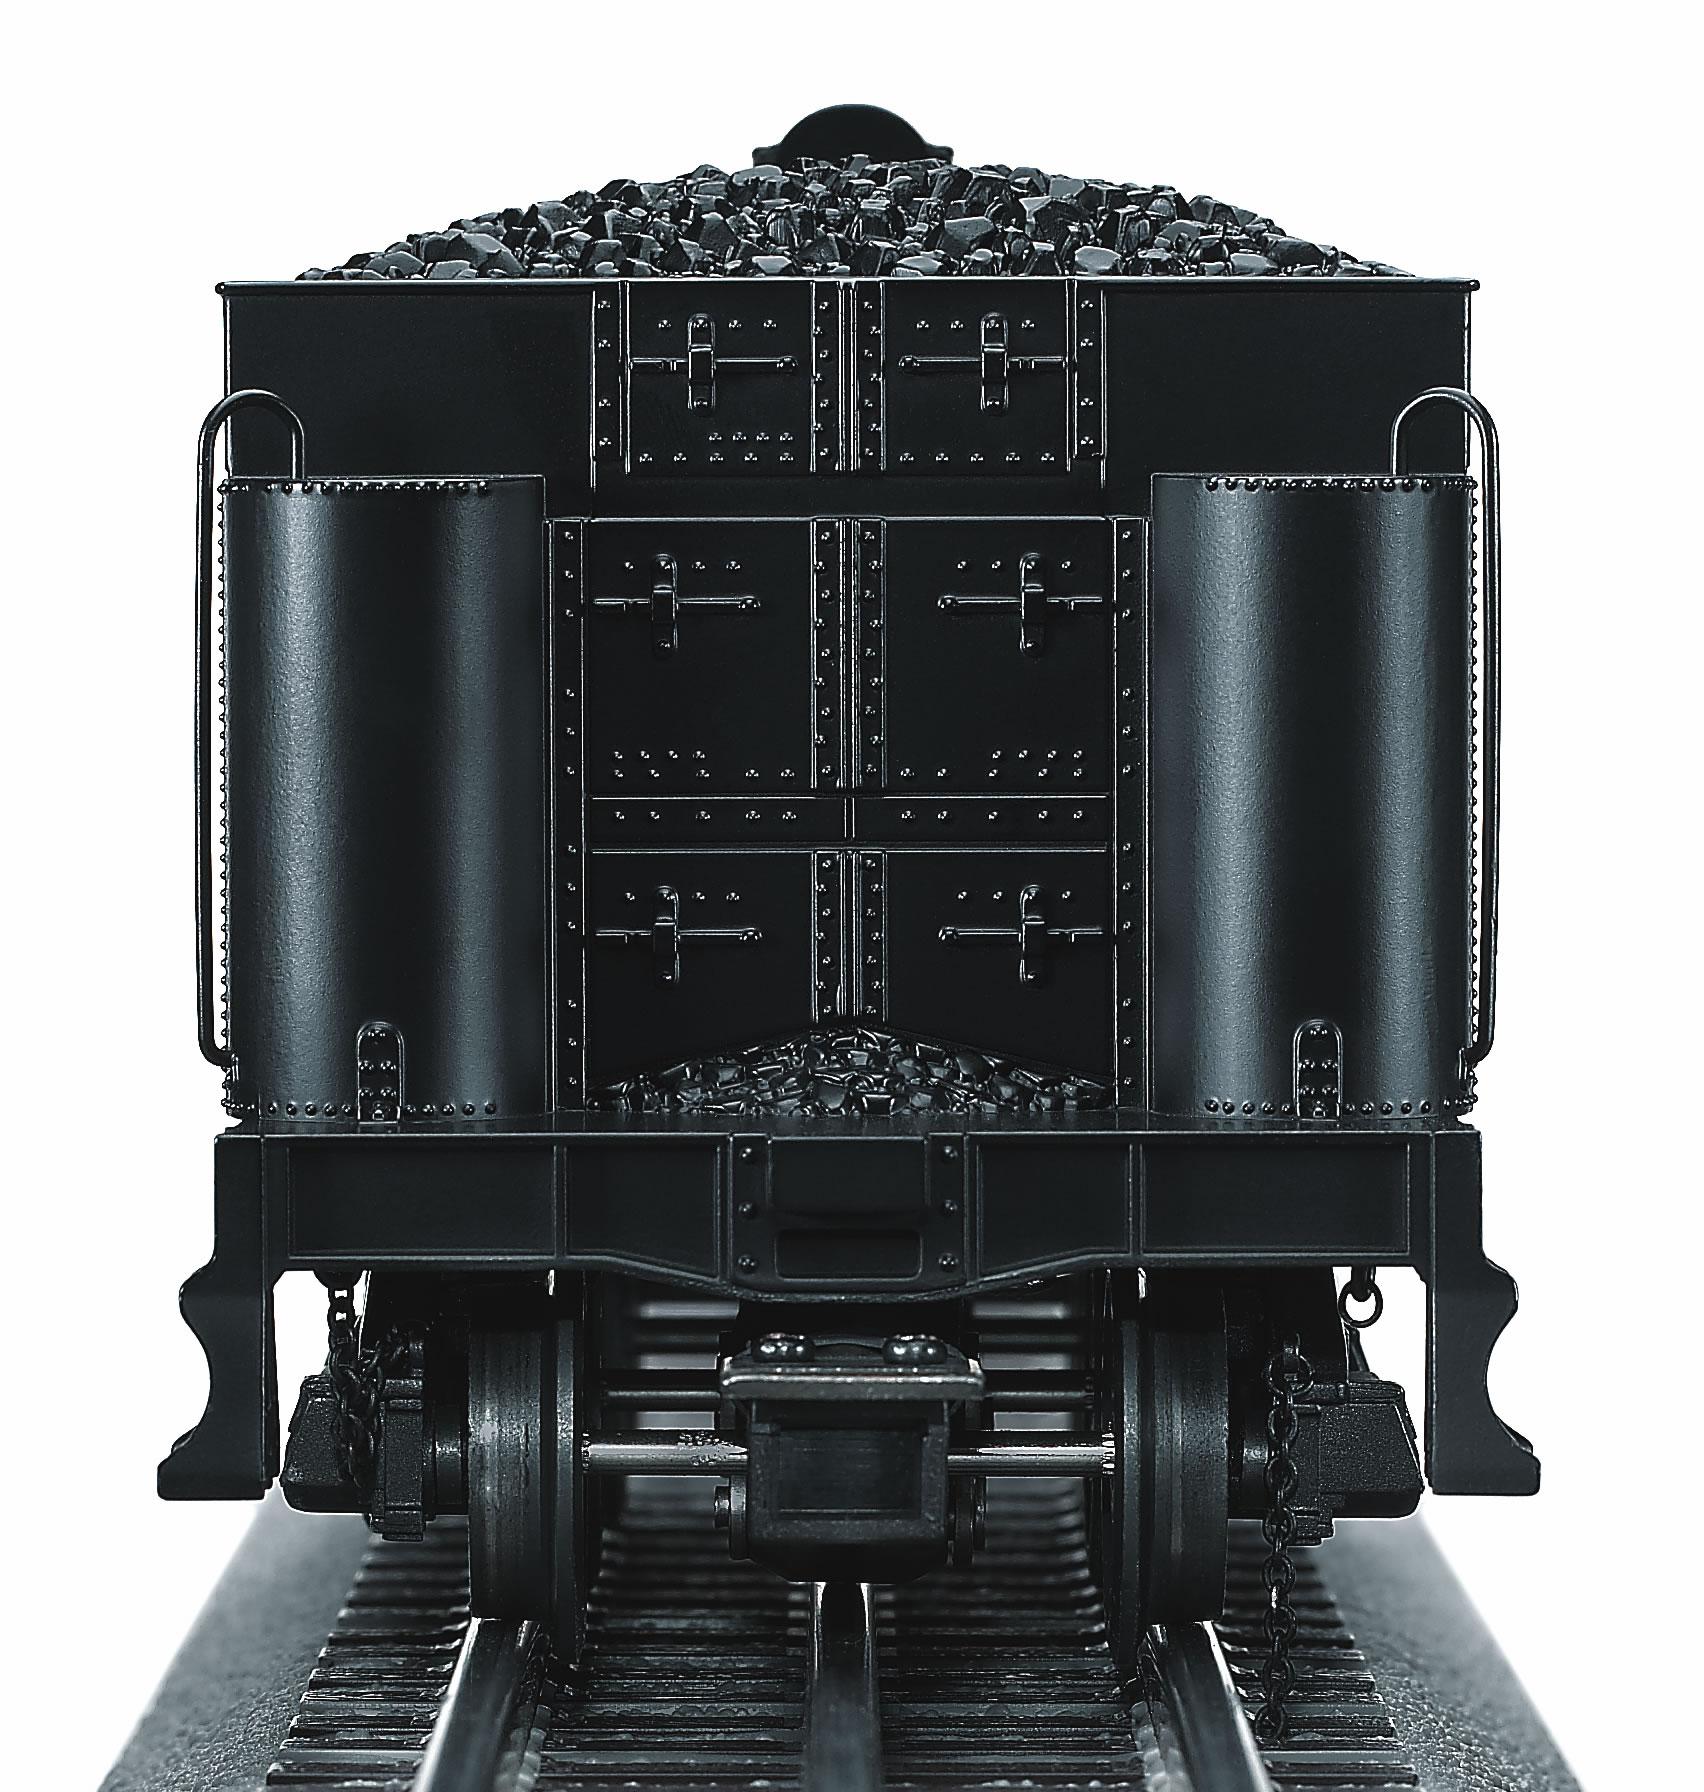 boston maine tmcc scale mogul steam locomotive  2 6 0 mogul parts list 2003 2 6 0 mogul pictorial diagram 2003 2 6 0 mogul wiring diagram 2003 2 6 0 mogul steam loco tender 7 04